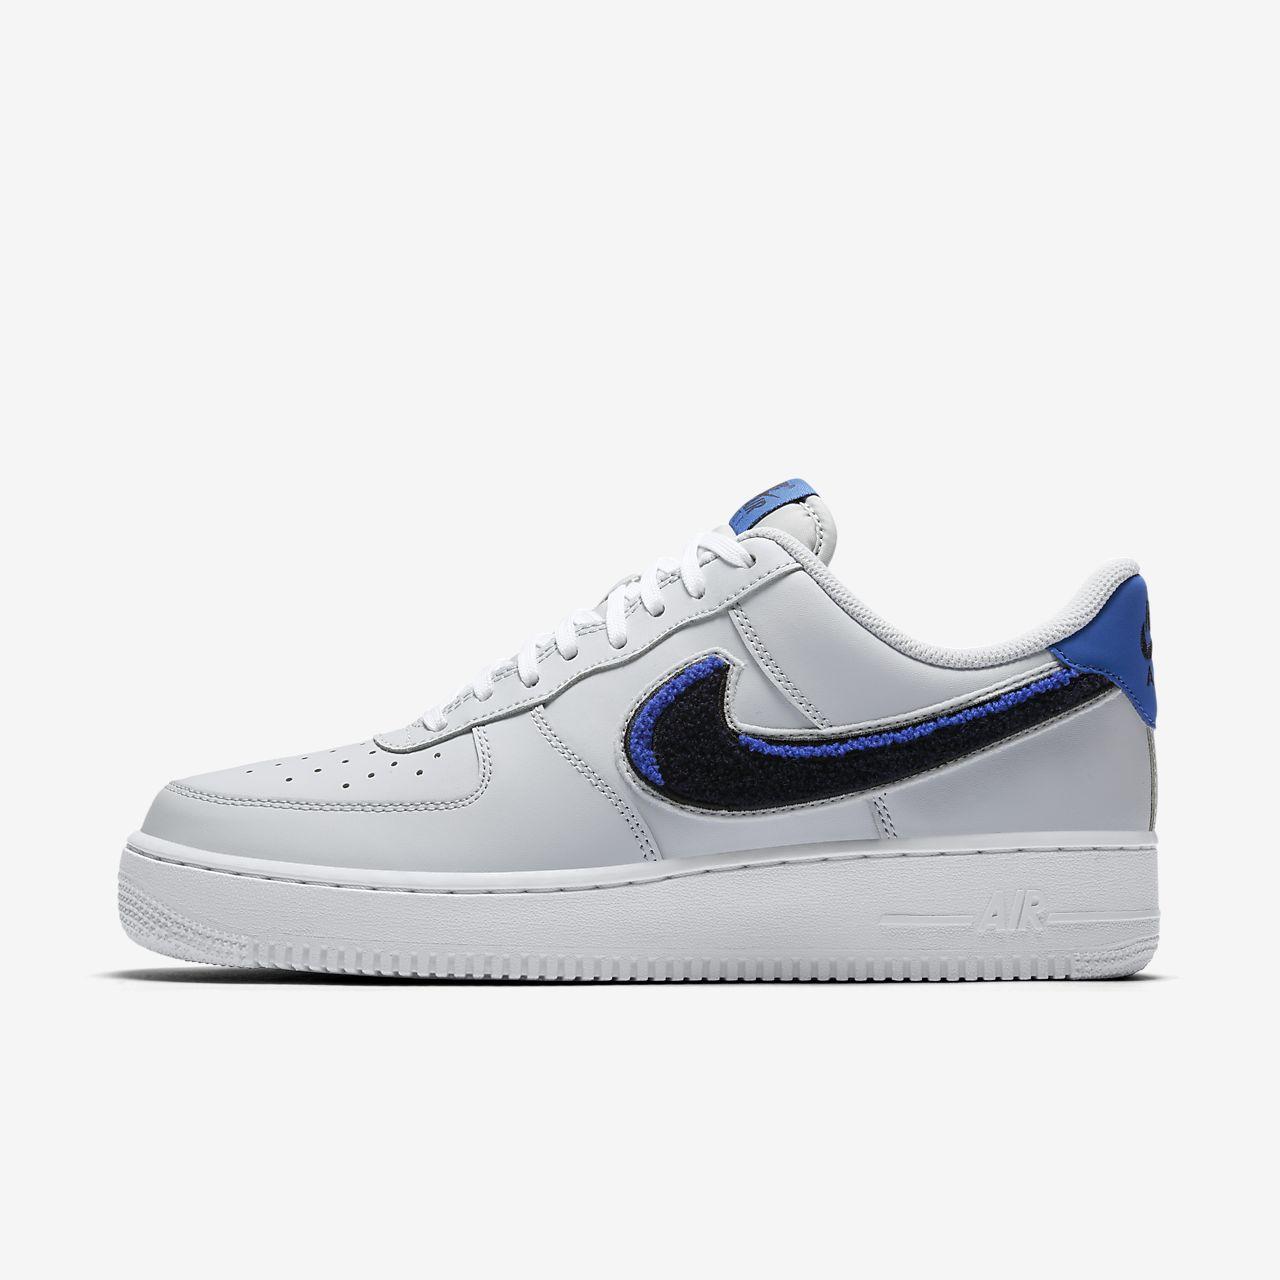 nike sportswear uomo air force 1 07 lv8